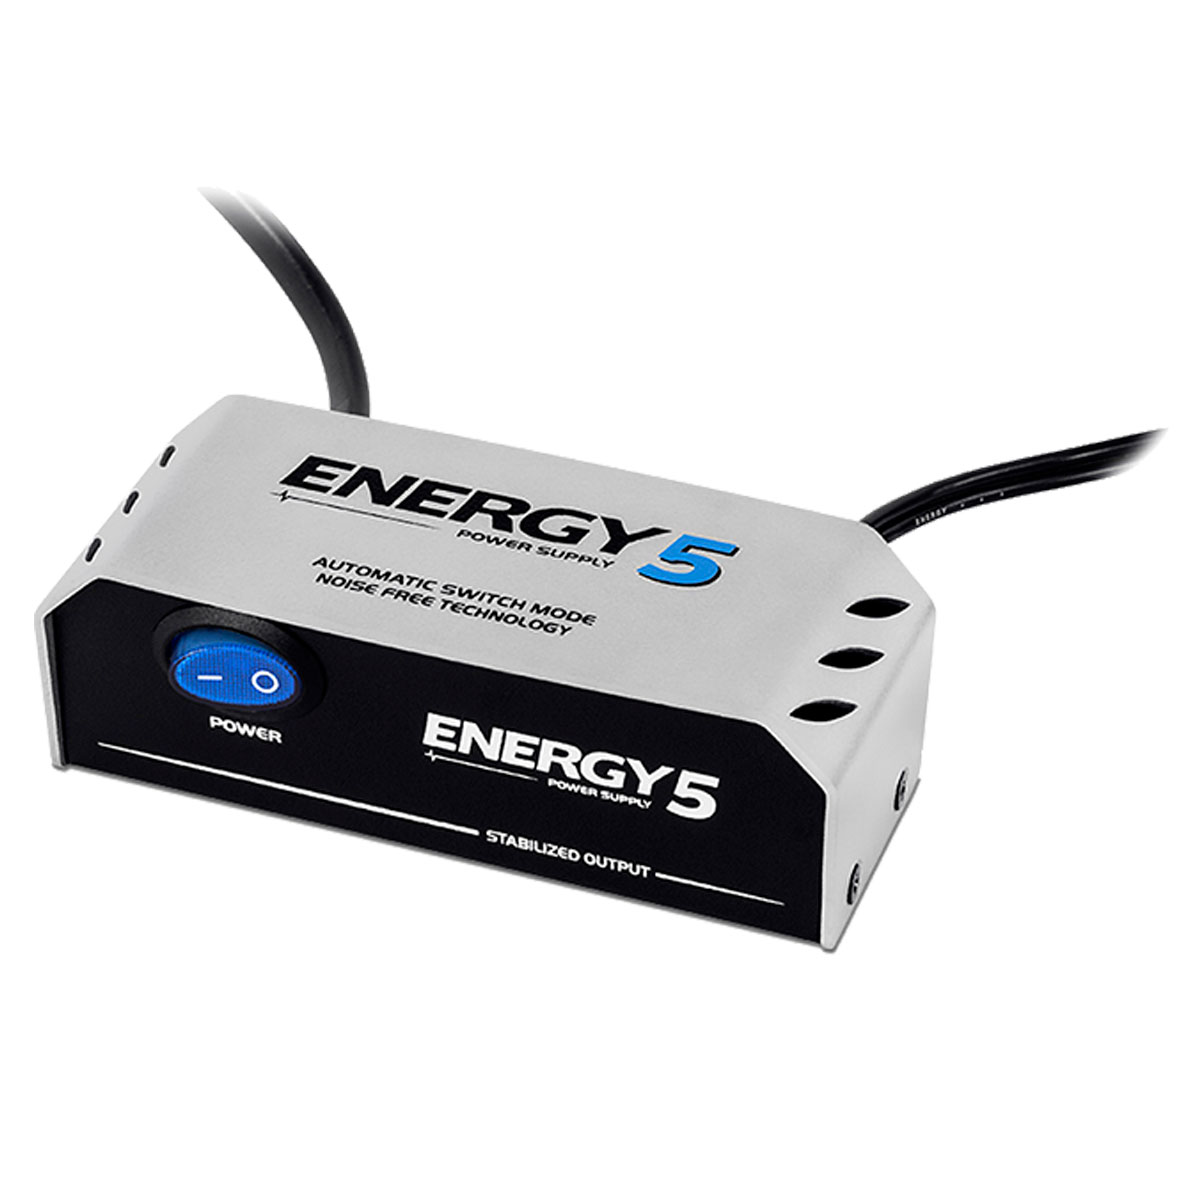 Fonte Automática 9V DC 1000mA 5 Plugs Energy 5 - Landscape